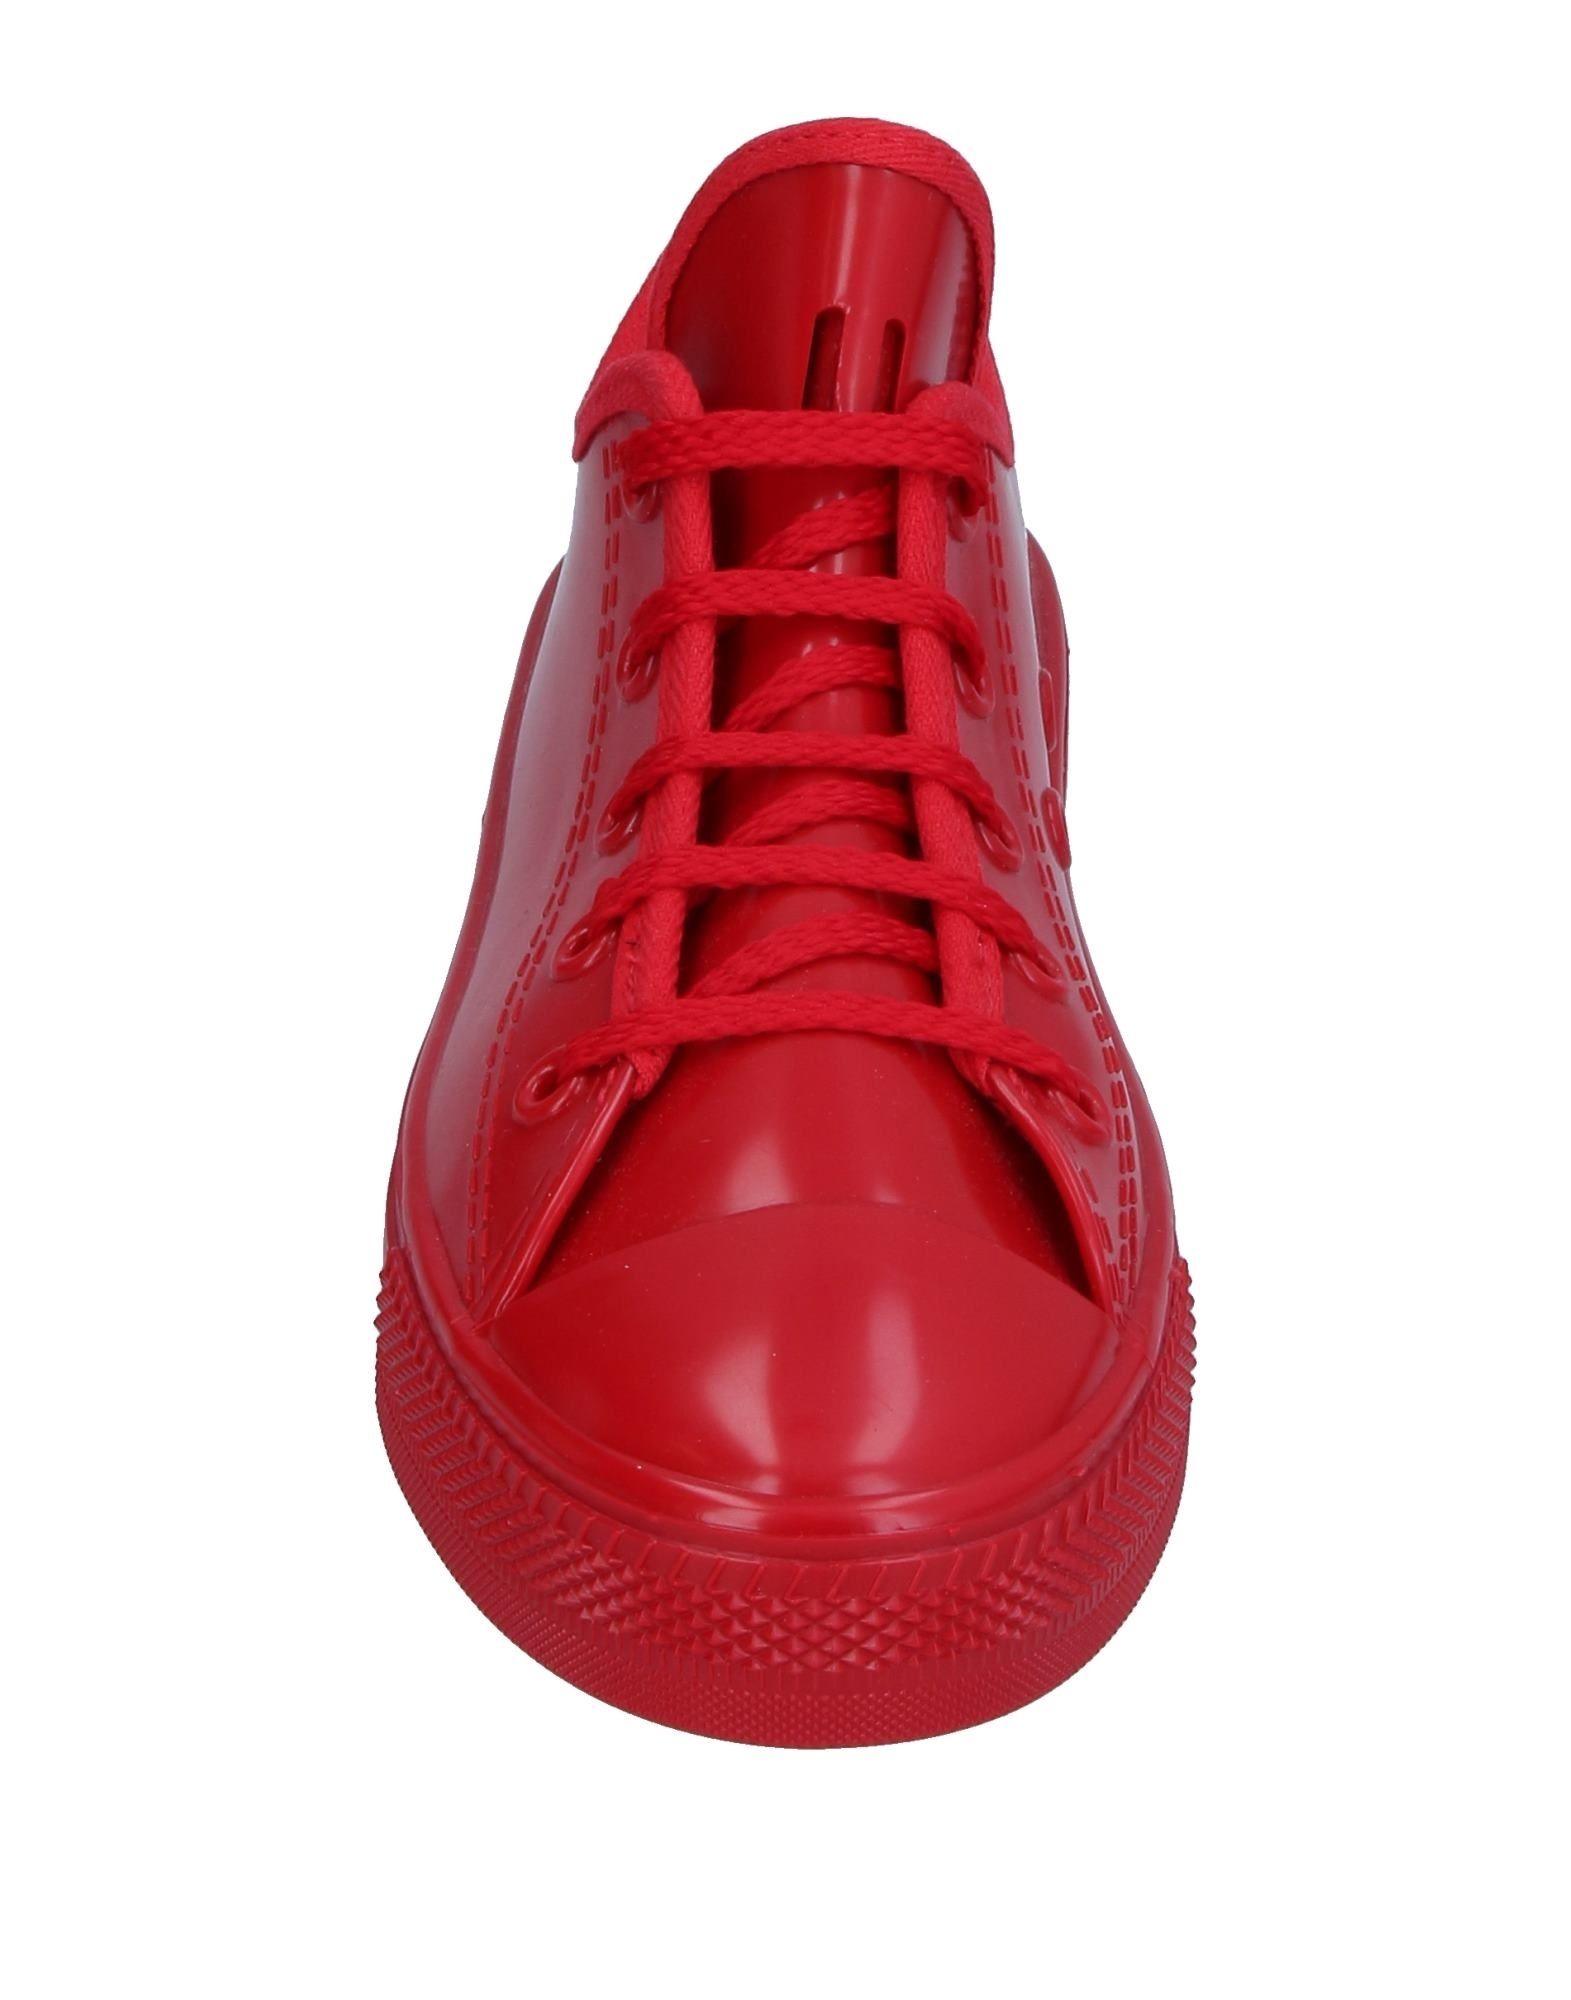 Sneakers Liviana Conti Femme - Sneakers Liviana Conti sur